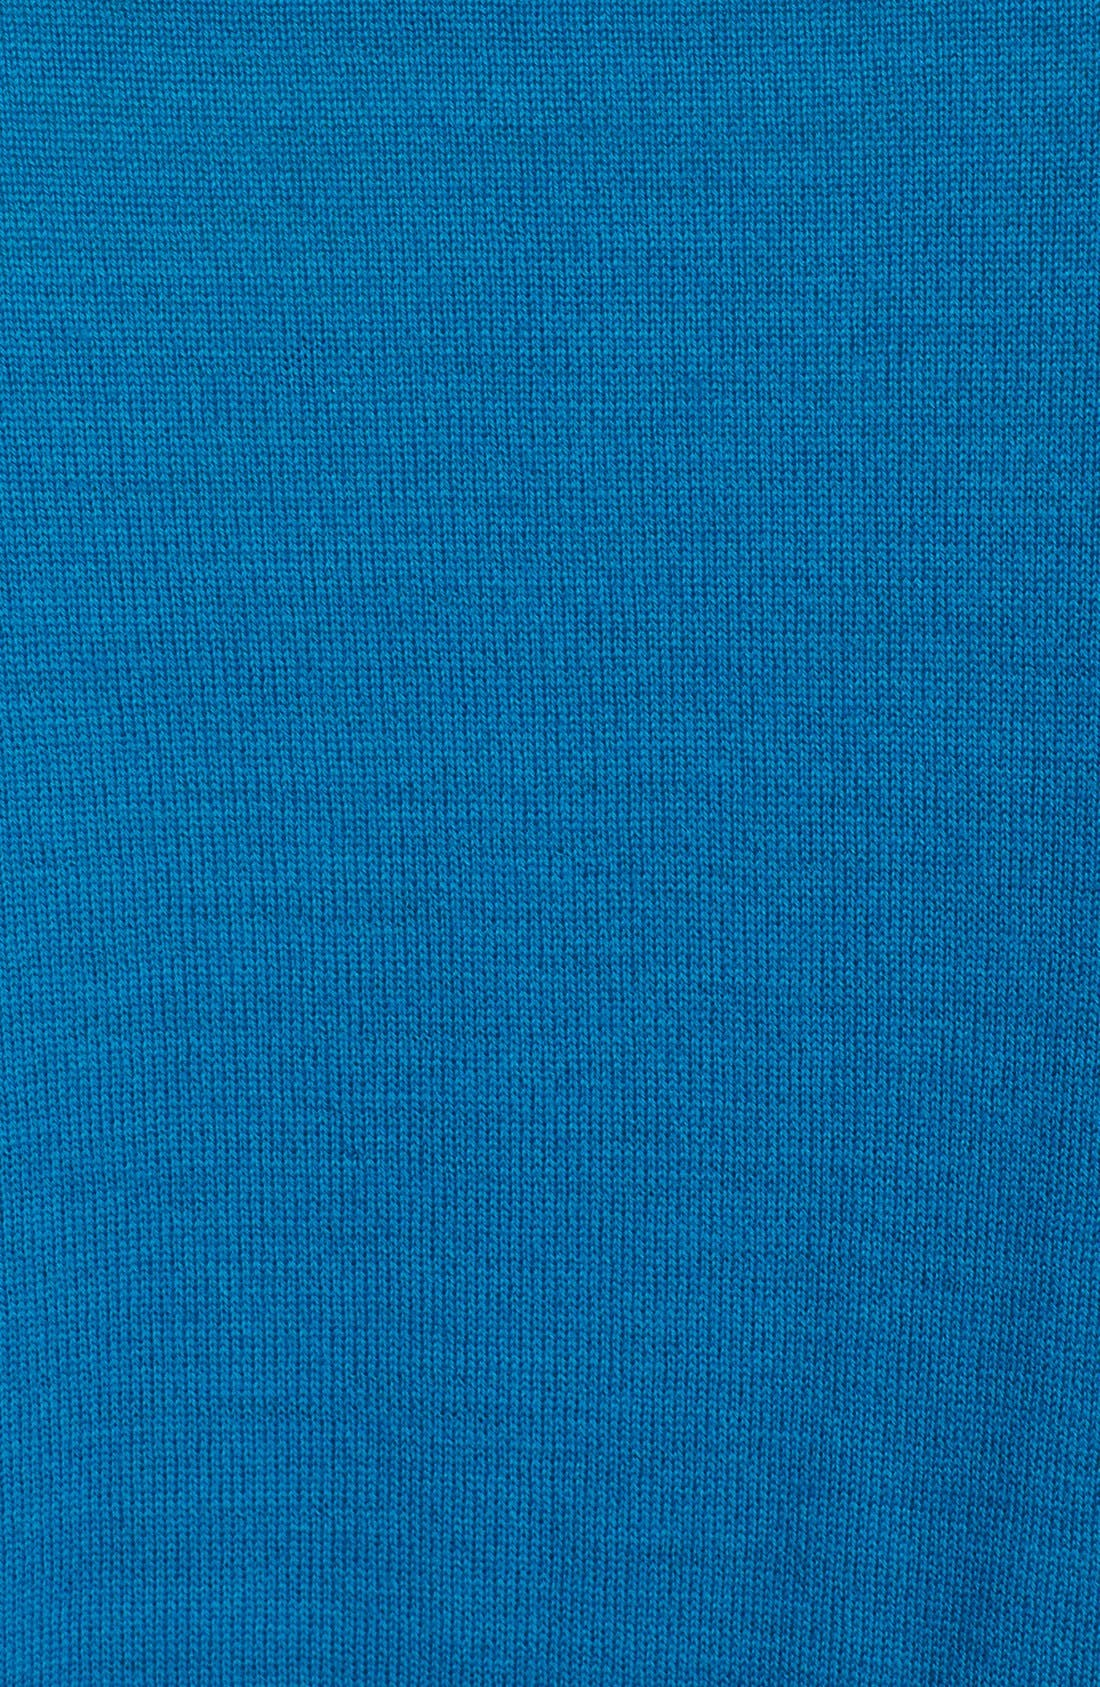 Alternate Image 3  - Proenza Schouler Superfine Merino Wool Sweater